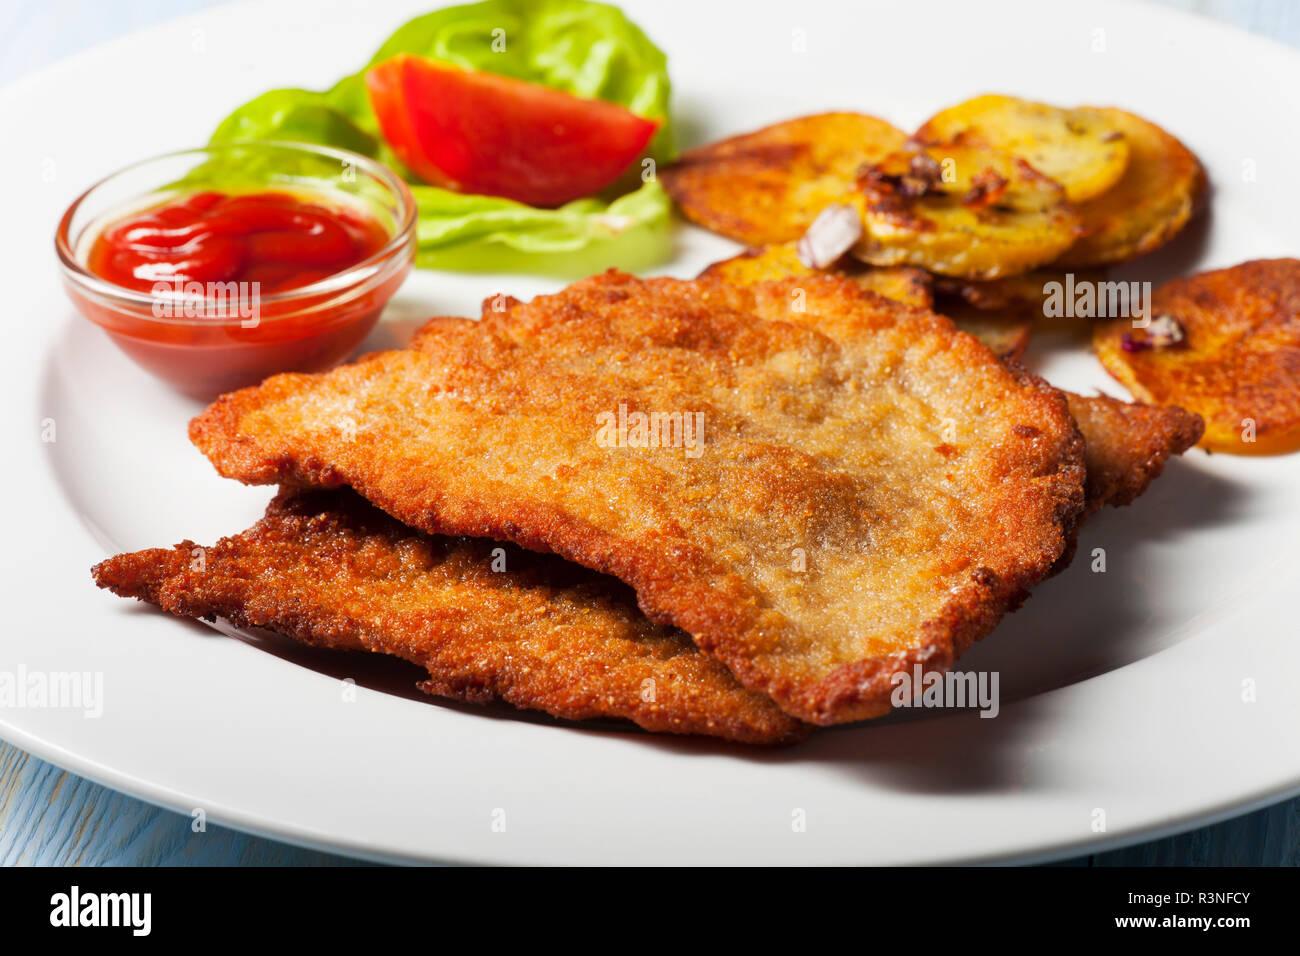 wiener schnitzel with fried potatoes Stock Photo